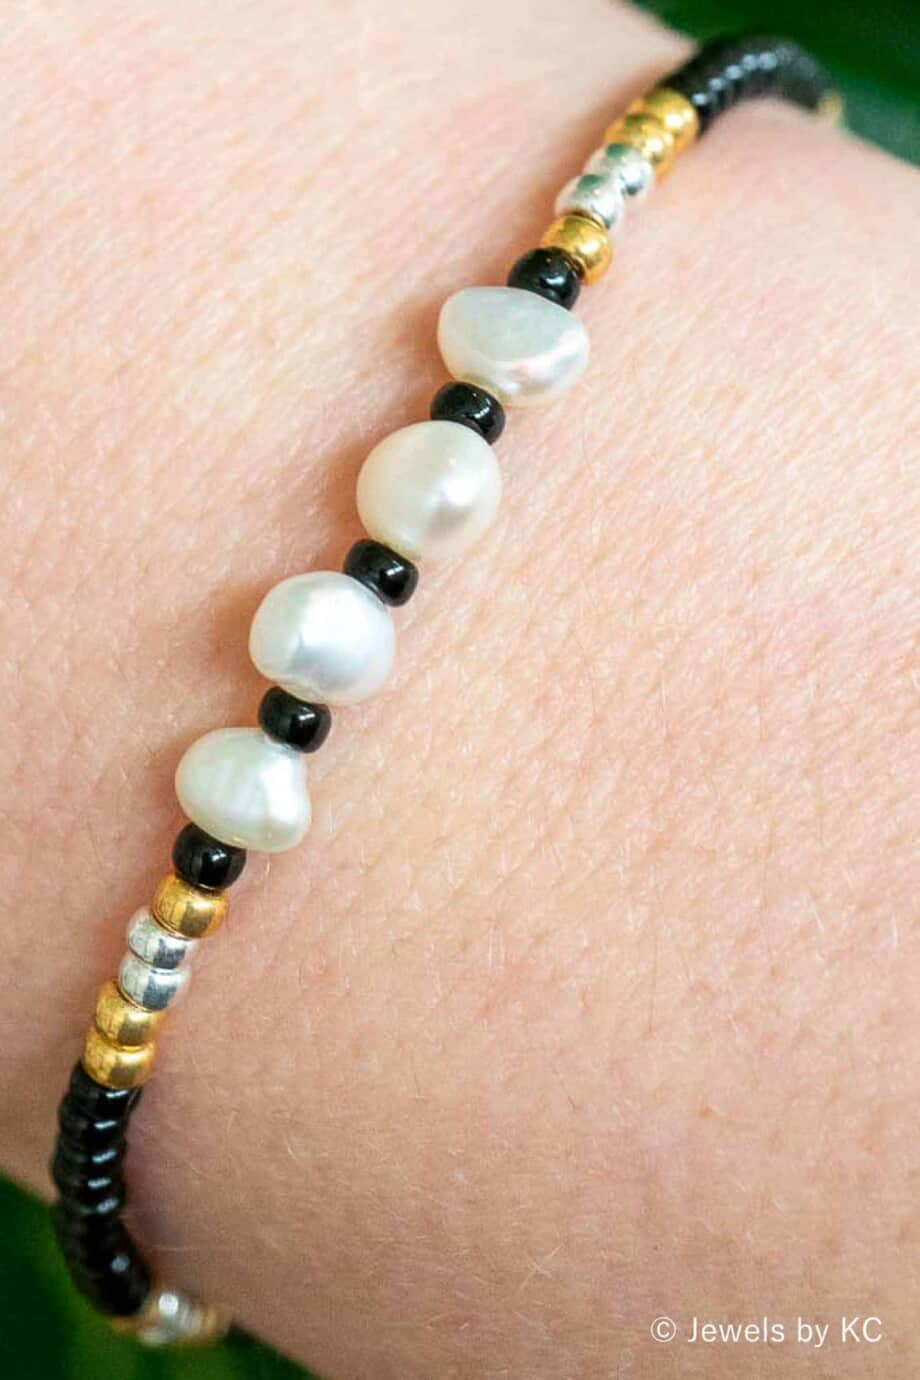 Gouden Miyuki Armbandje 'Royal' met Zoetwater parels